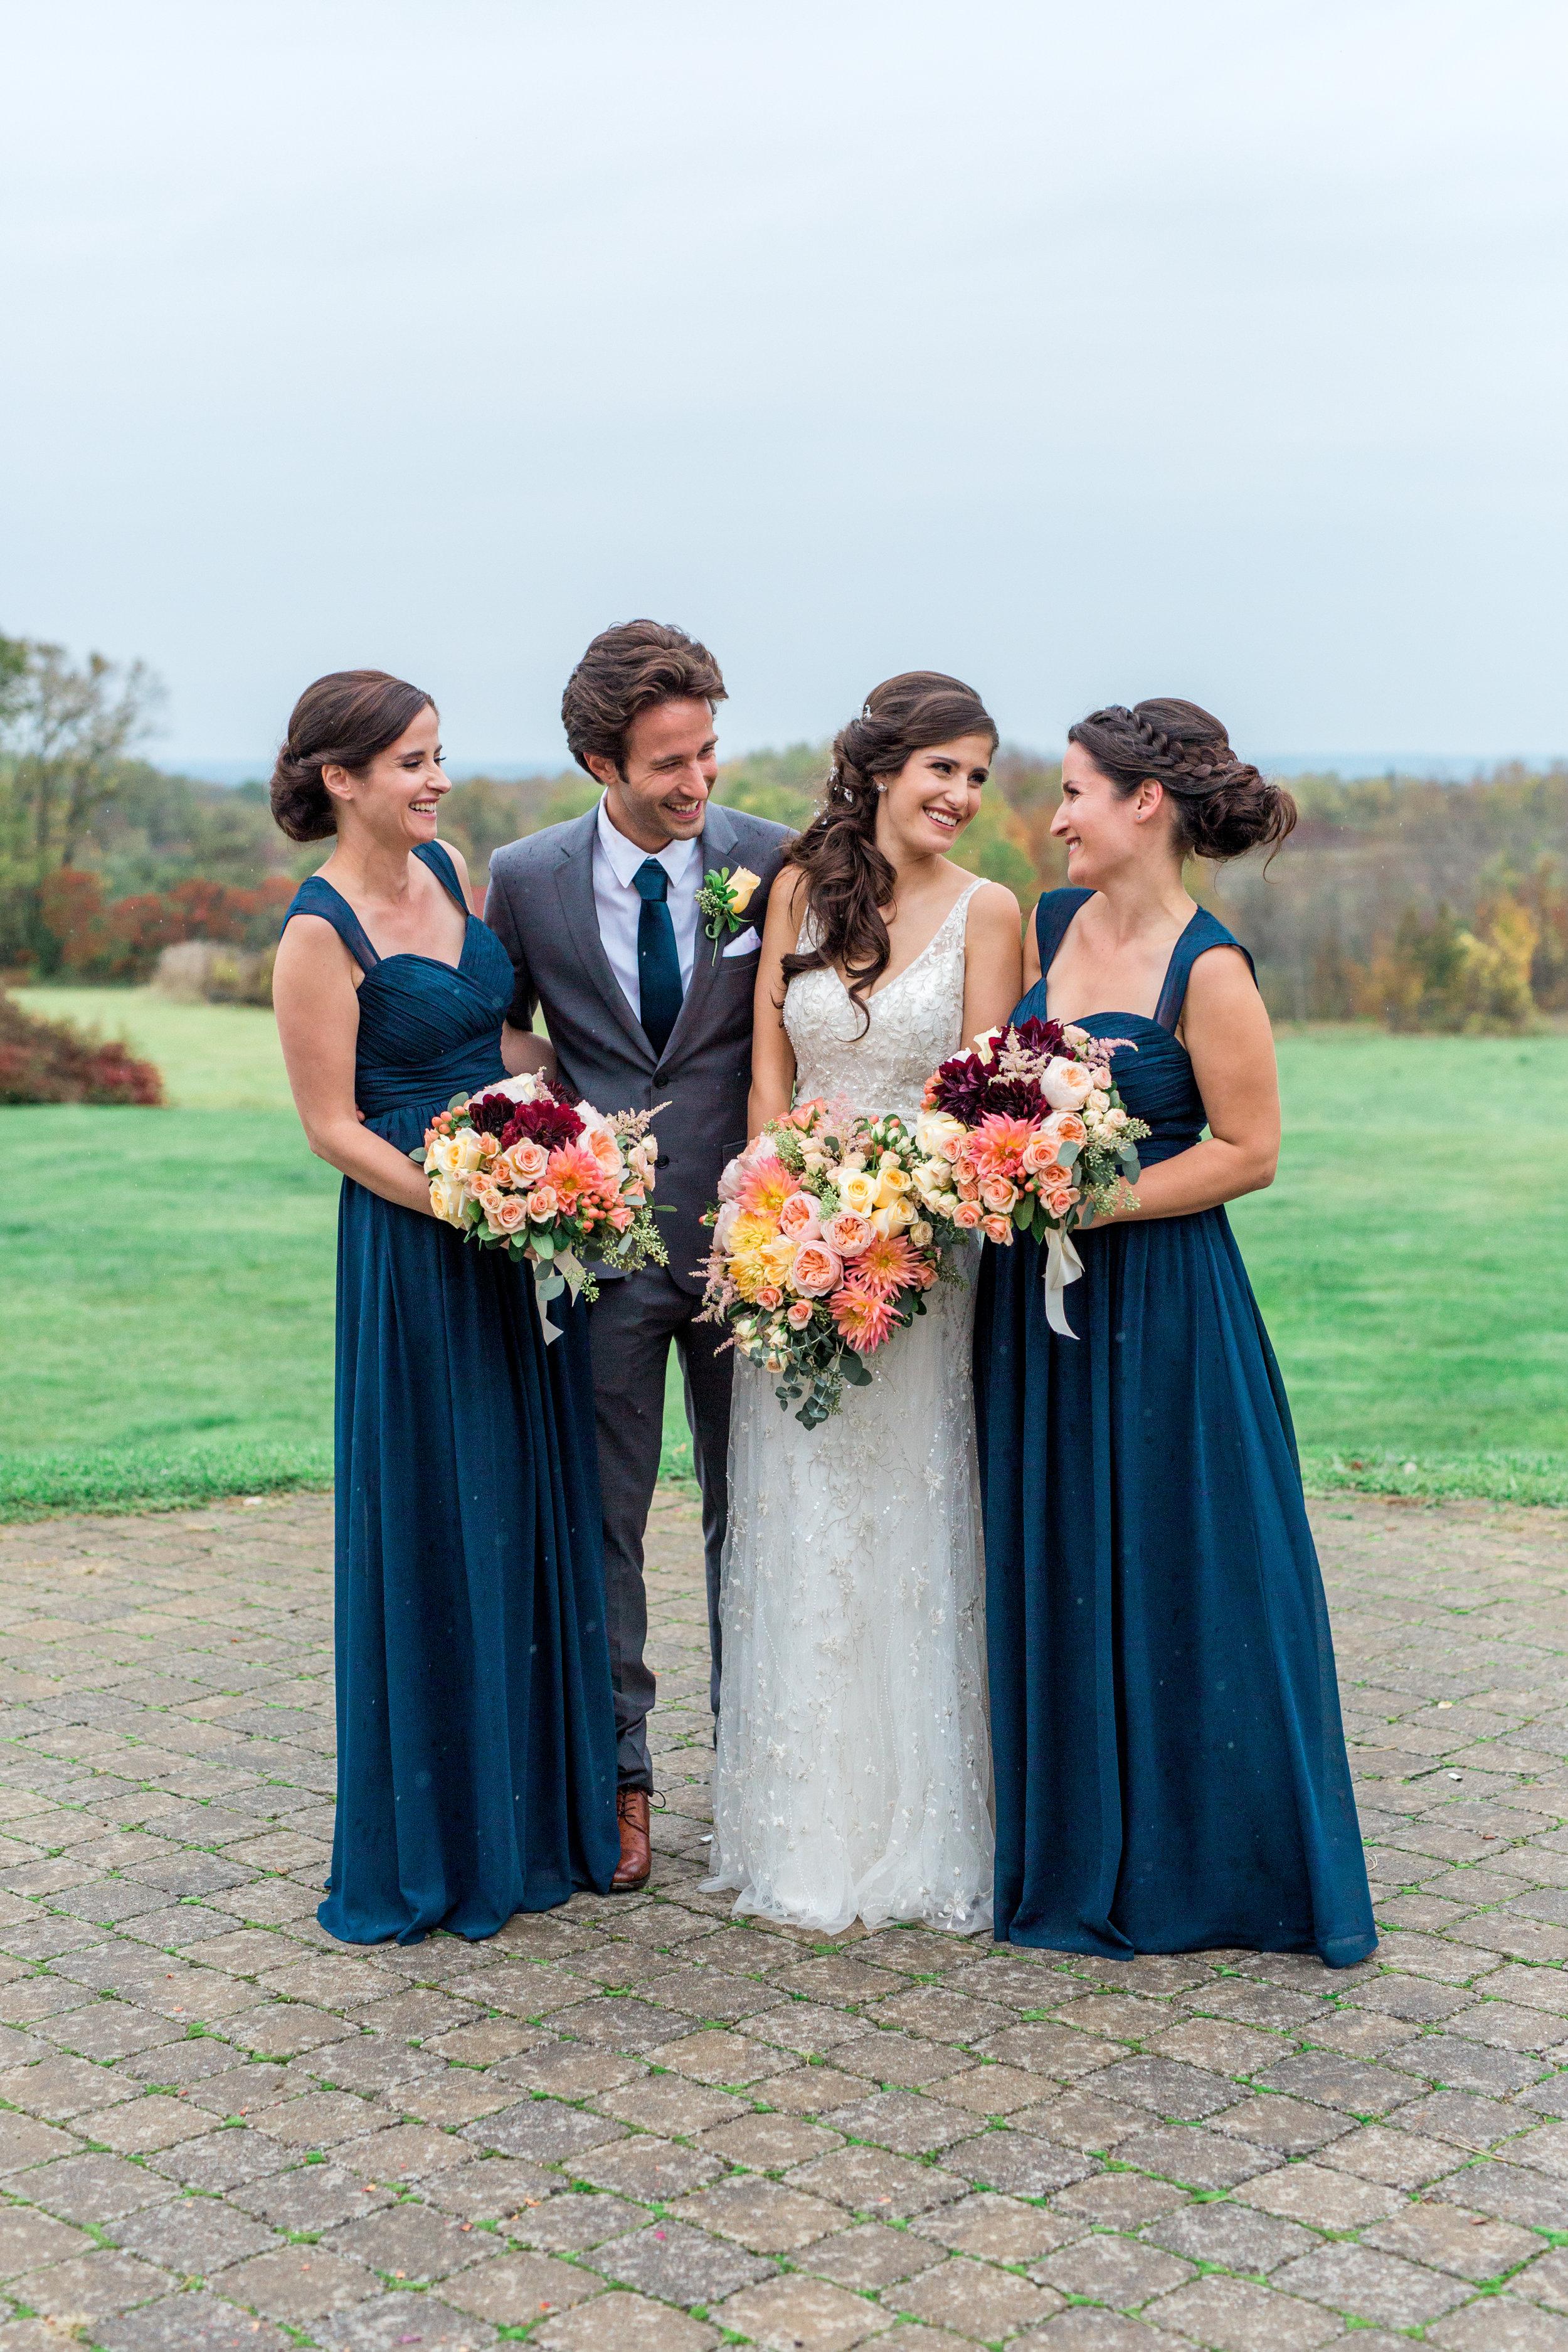 Amir-Golbazi-Danielle-Giroux-Photography_Toronto-Wedding_Cedarwood_Rachel-Paul_427.jpg